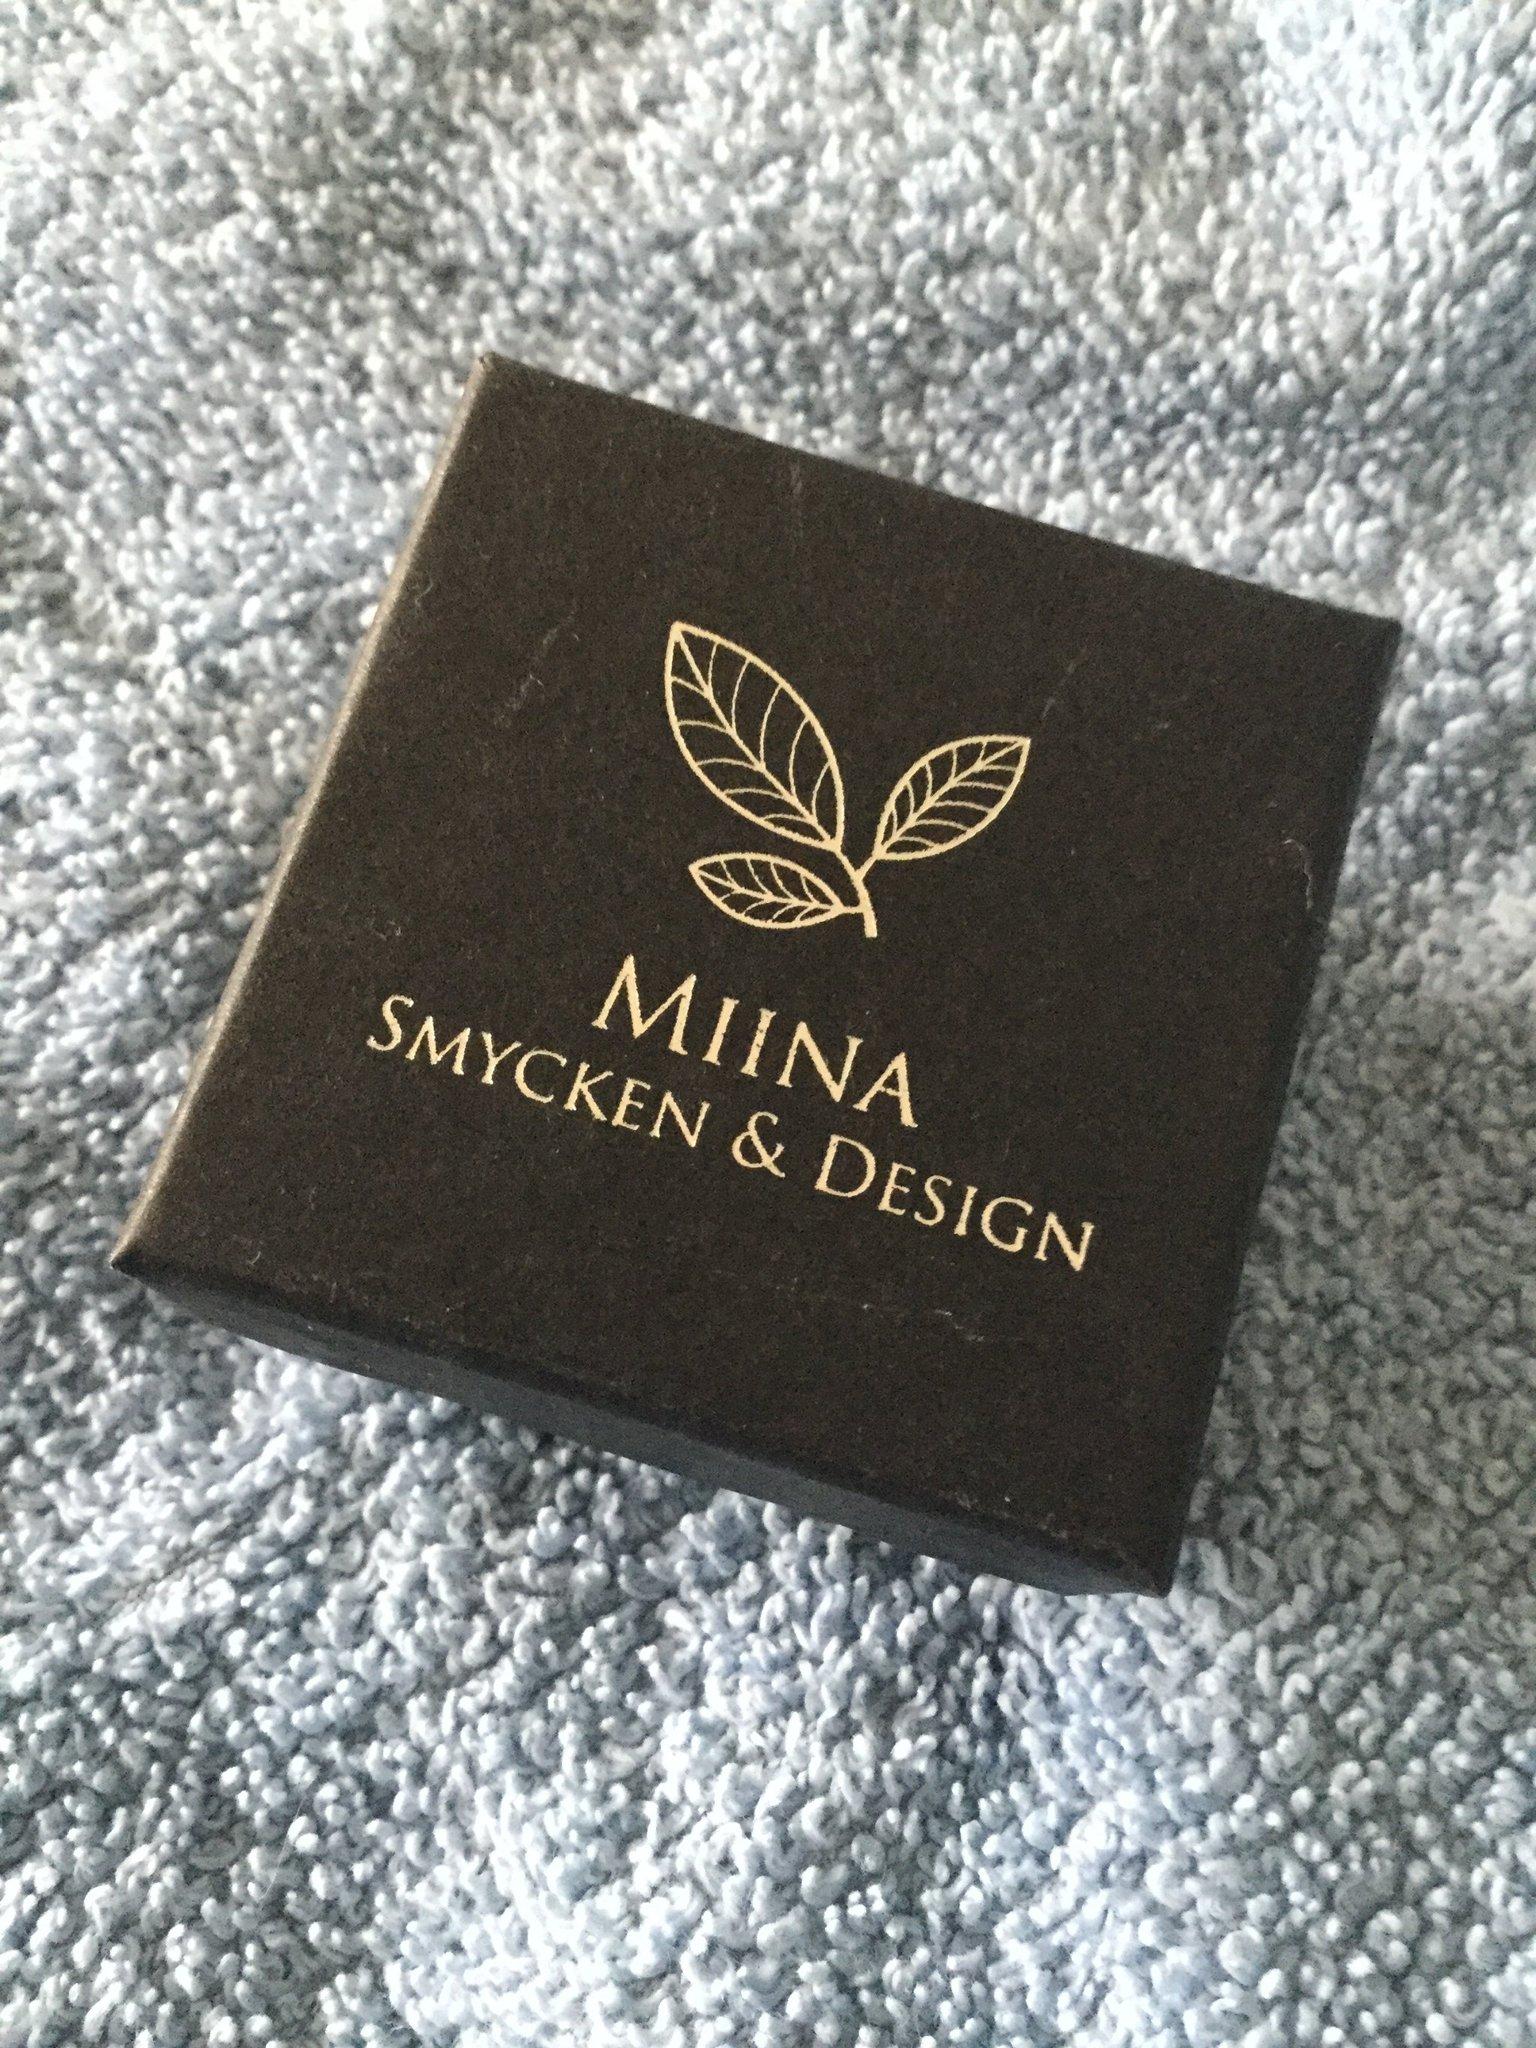 MIINA Smycken & Design